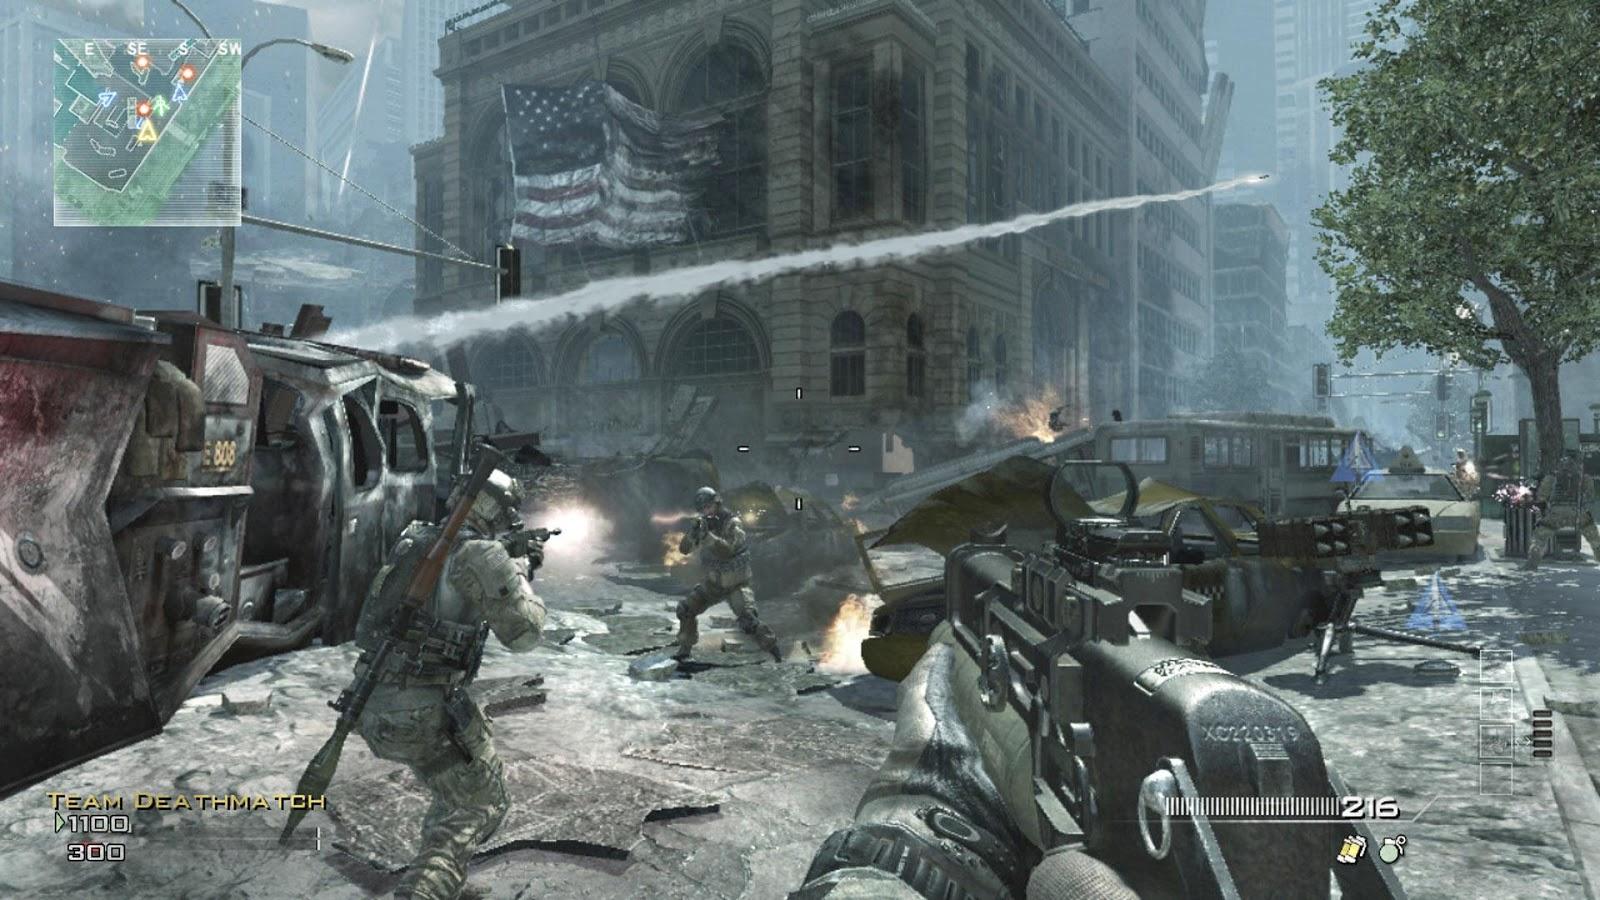 Call of Duty: modern warfare 3 free download full version